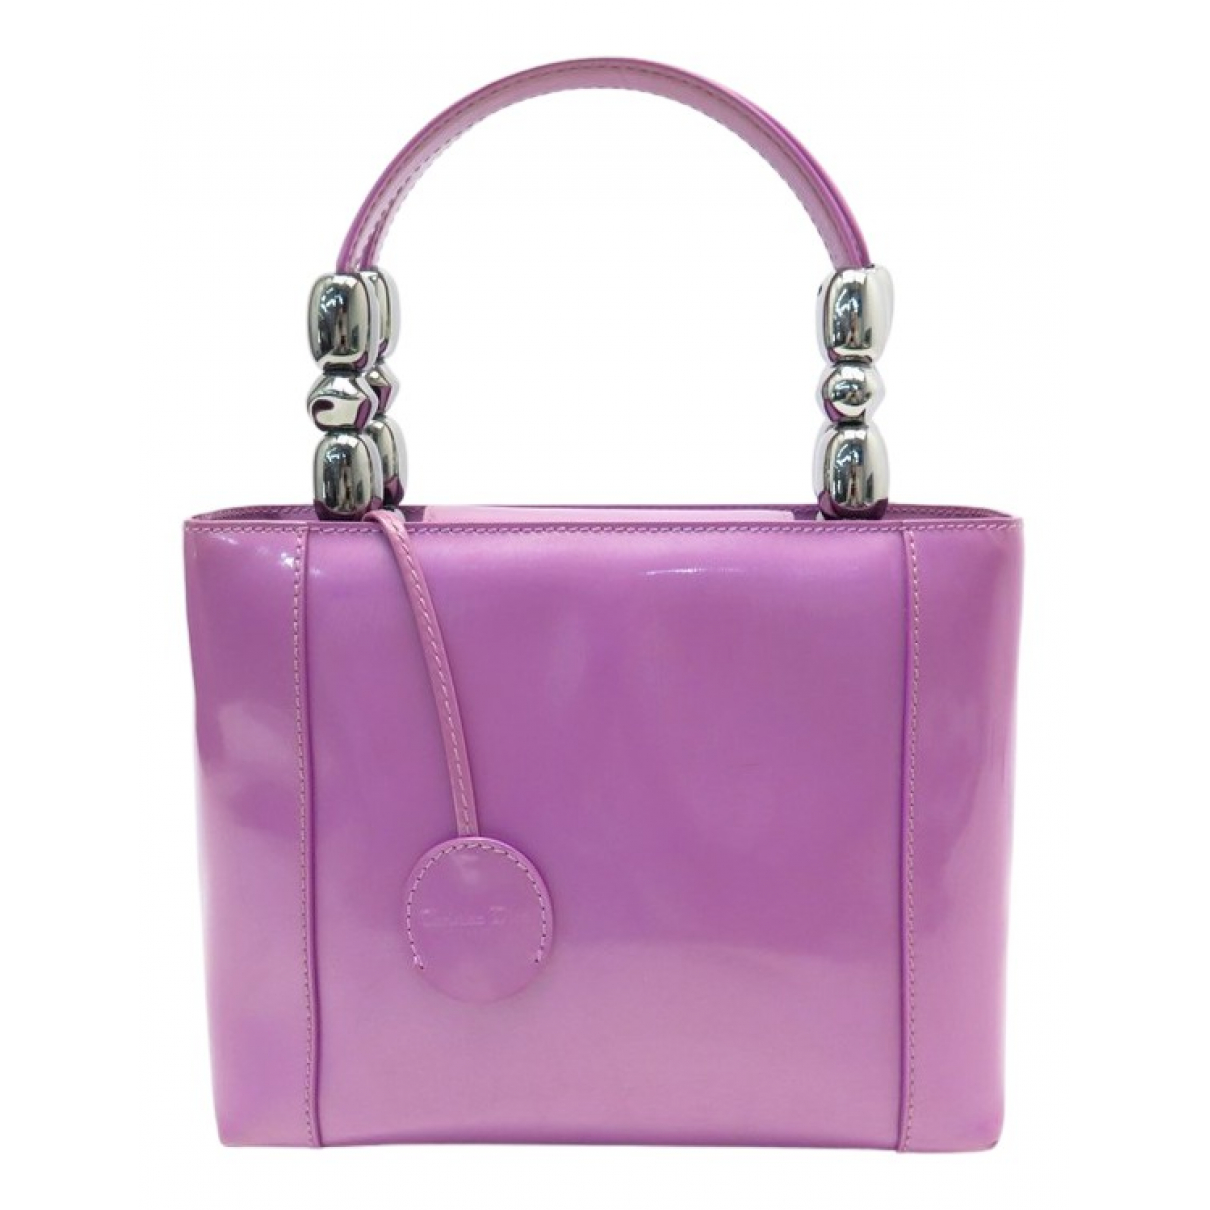 Dior \N Purple Patent leather handbag for Women \N